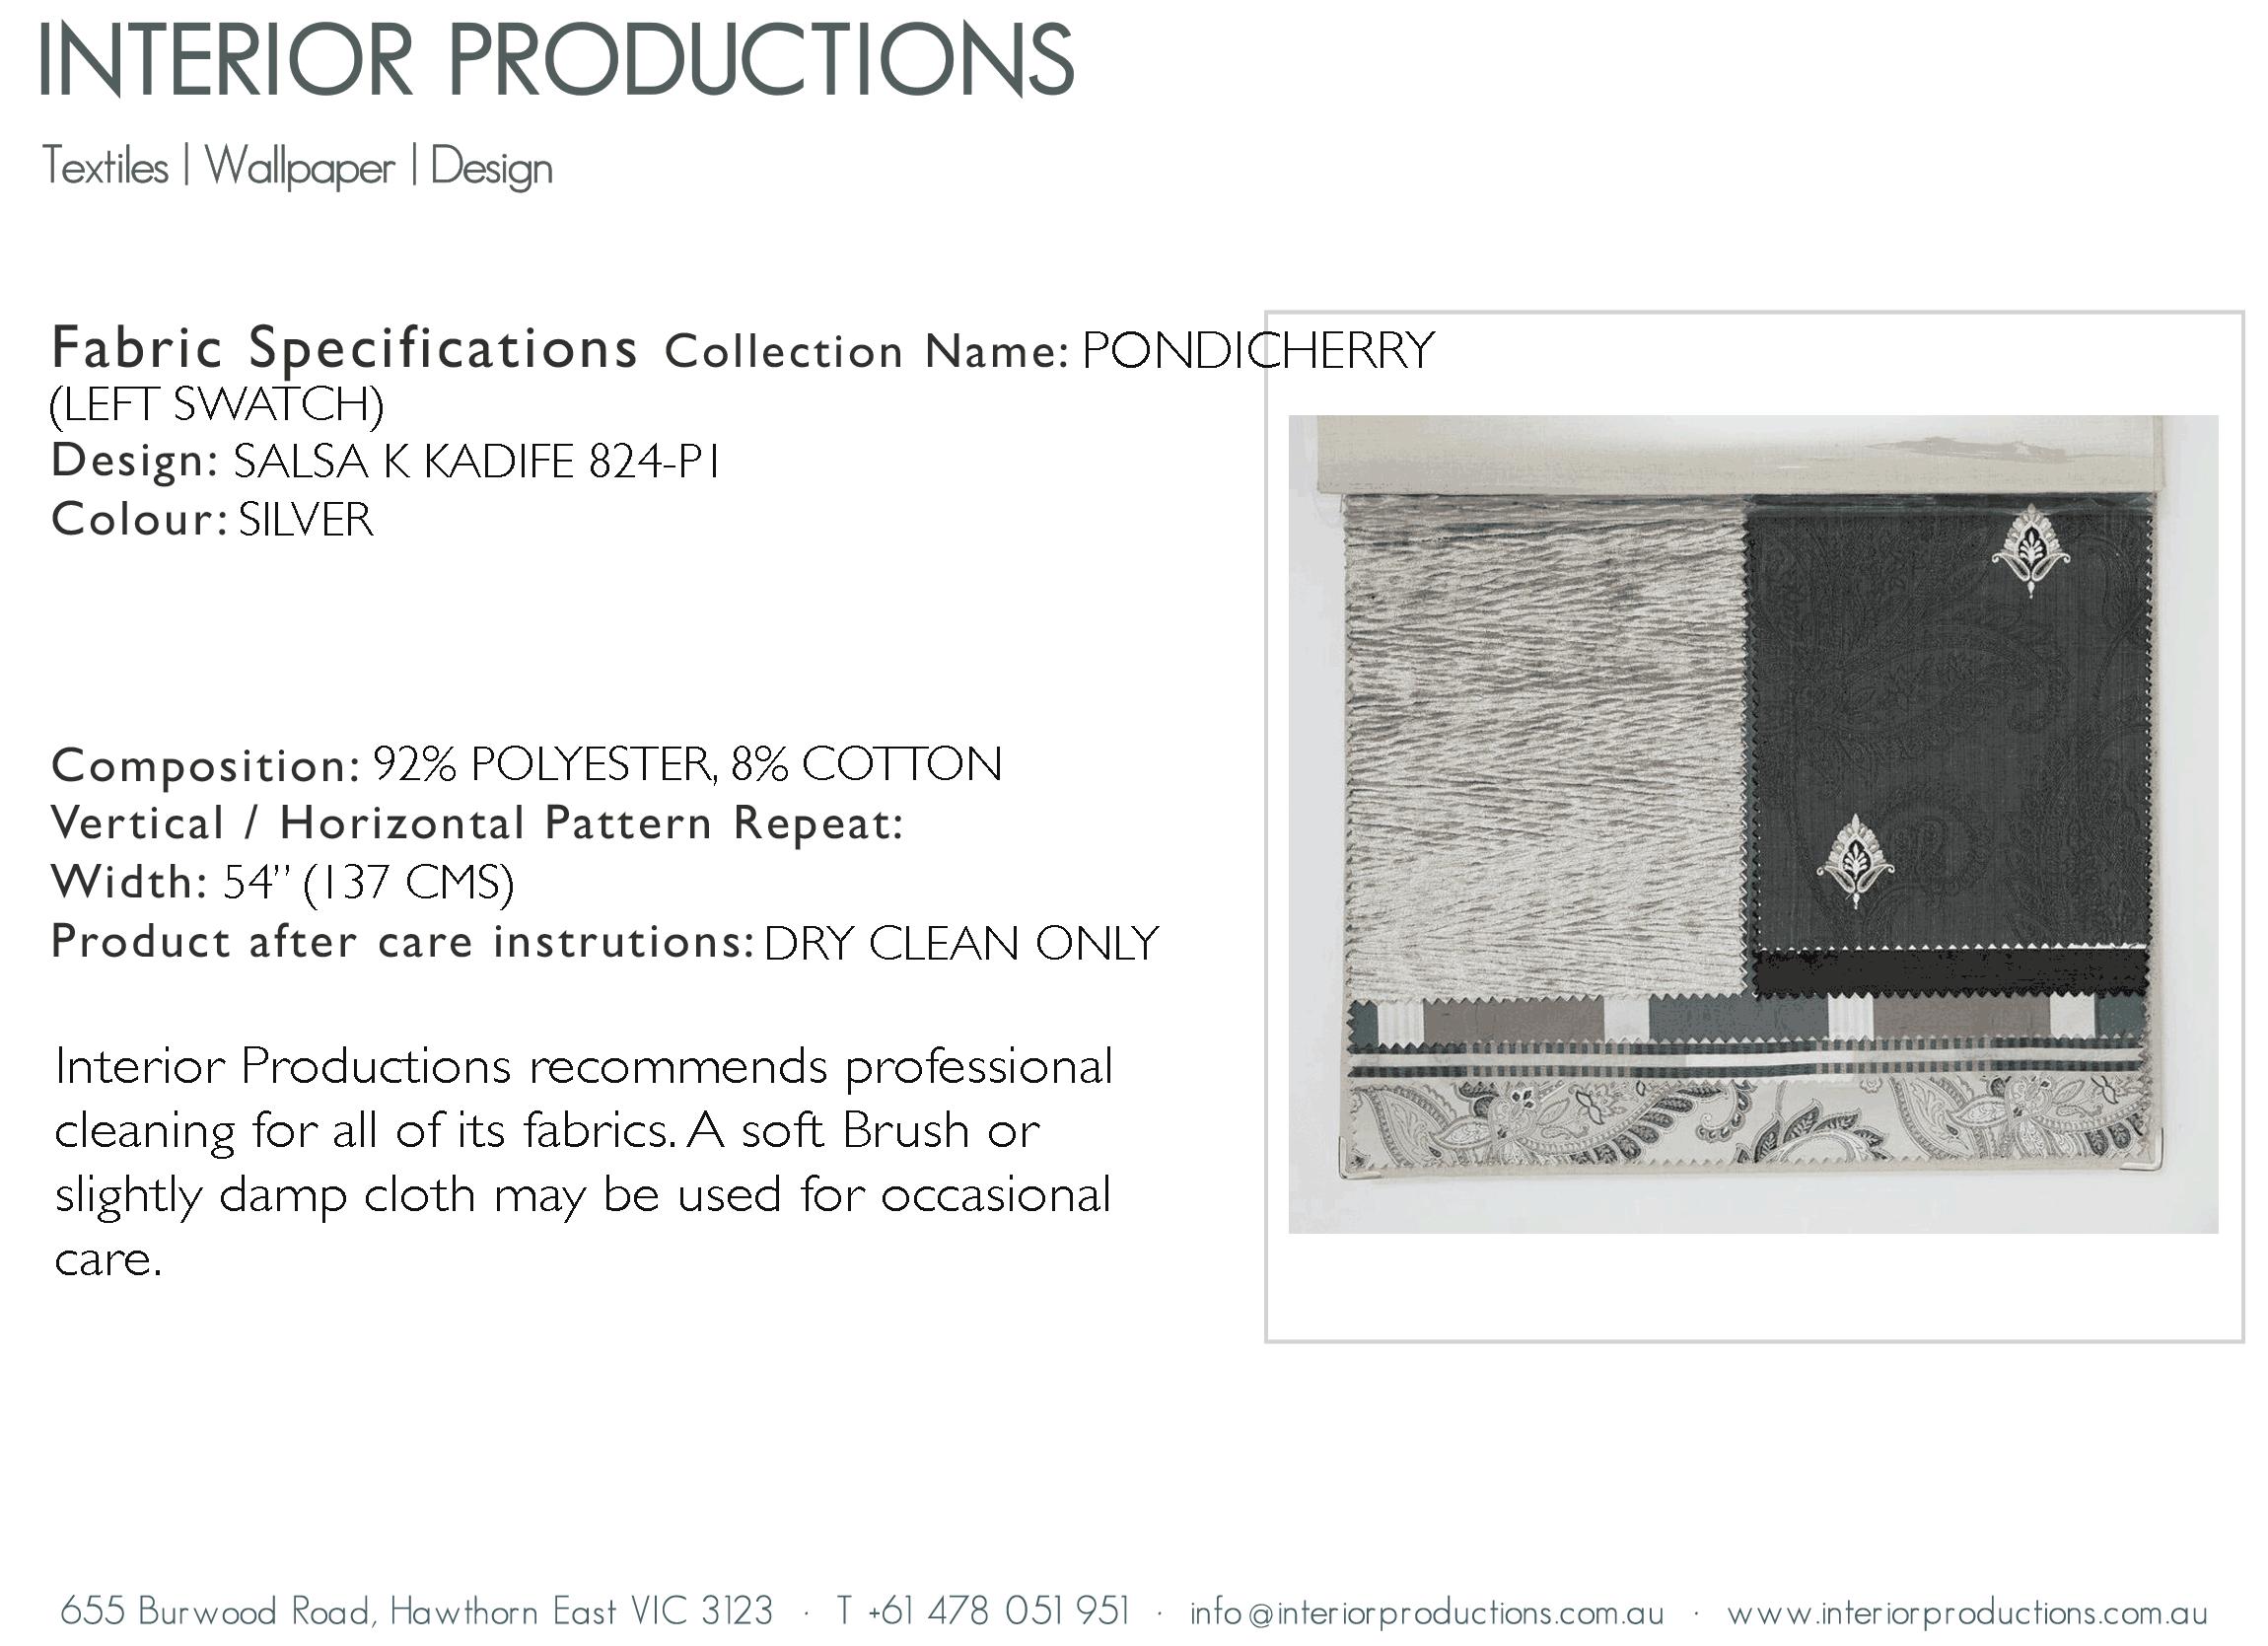 interior_productions_SALSA-K-KADIFE-824-P1---SILVER